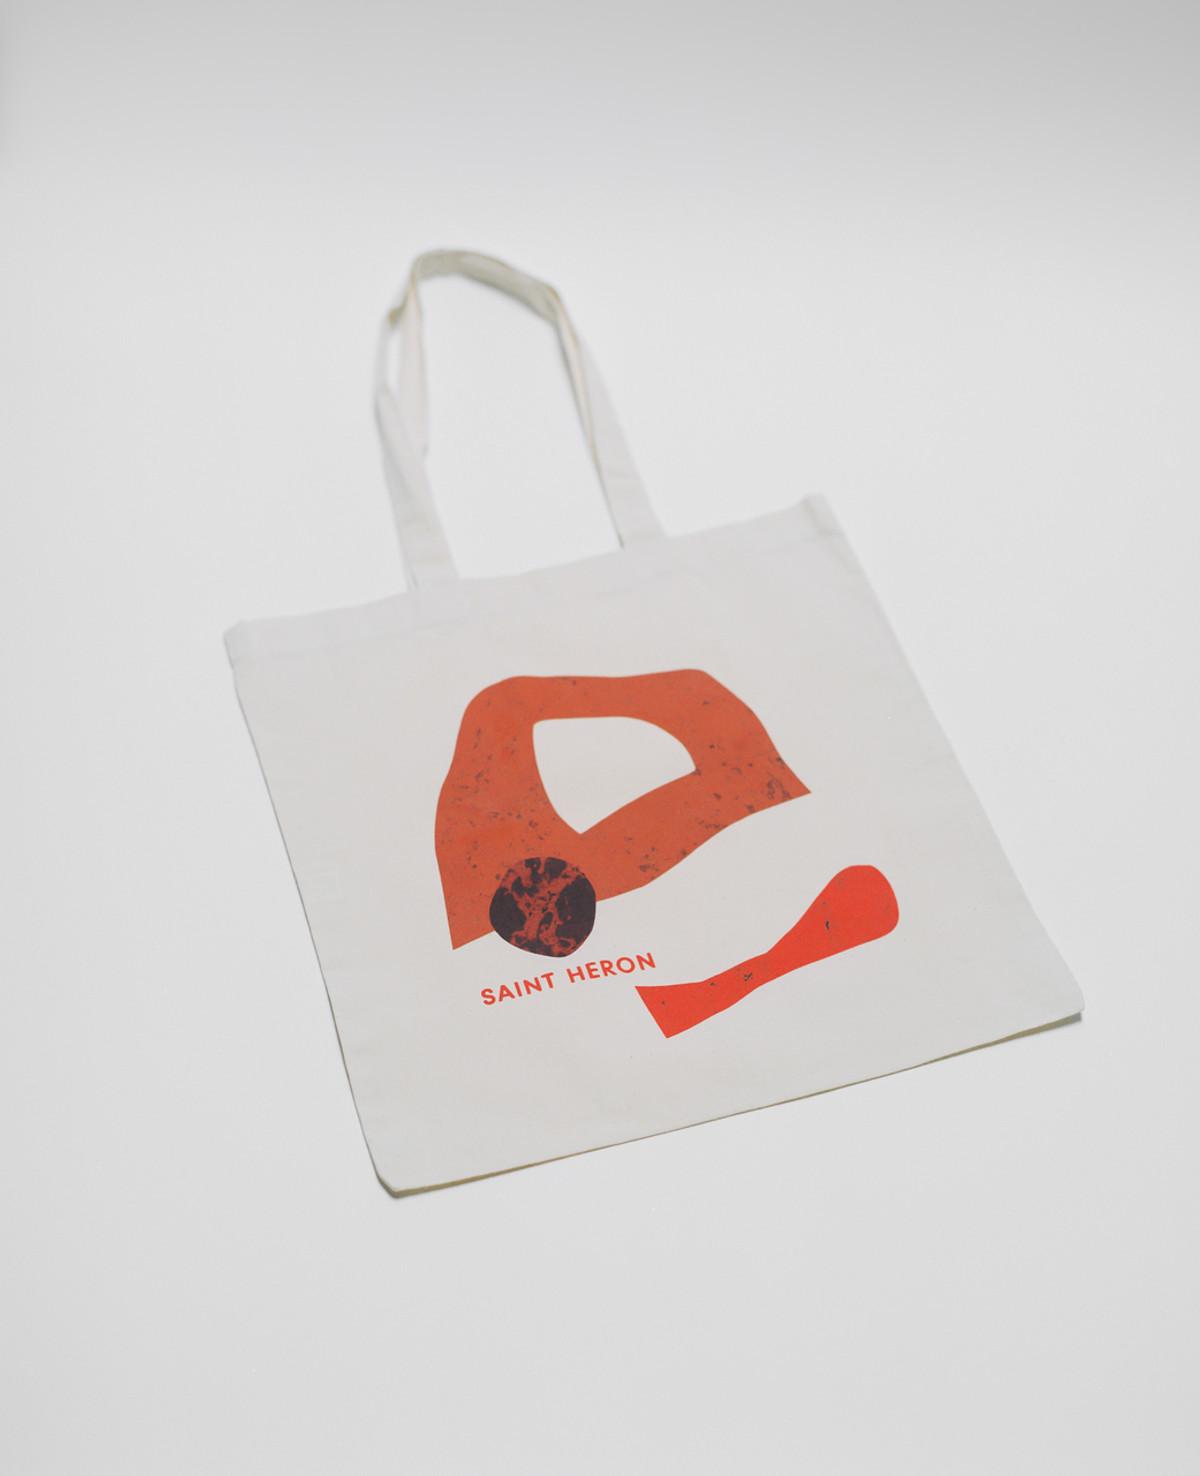 Saint Heron Tote Bag - Multi-Shape